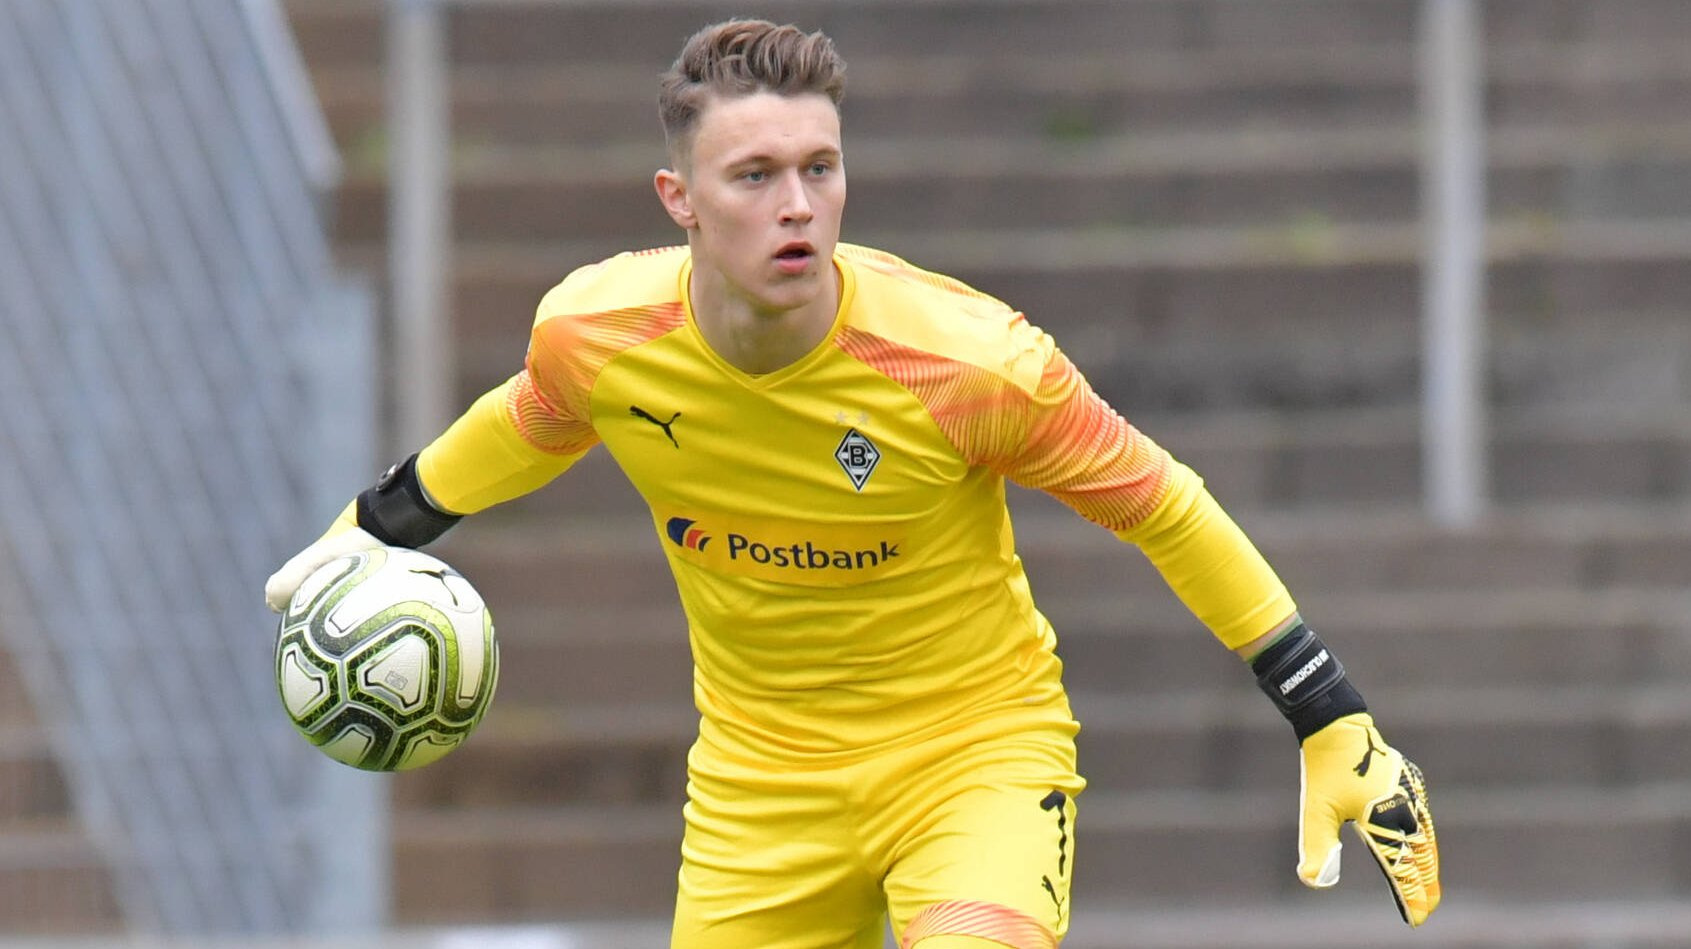 Borussia Monchengladbach Grosses Torwarttalent Olschowsky Erhalt Profivertrag Transfermarkt